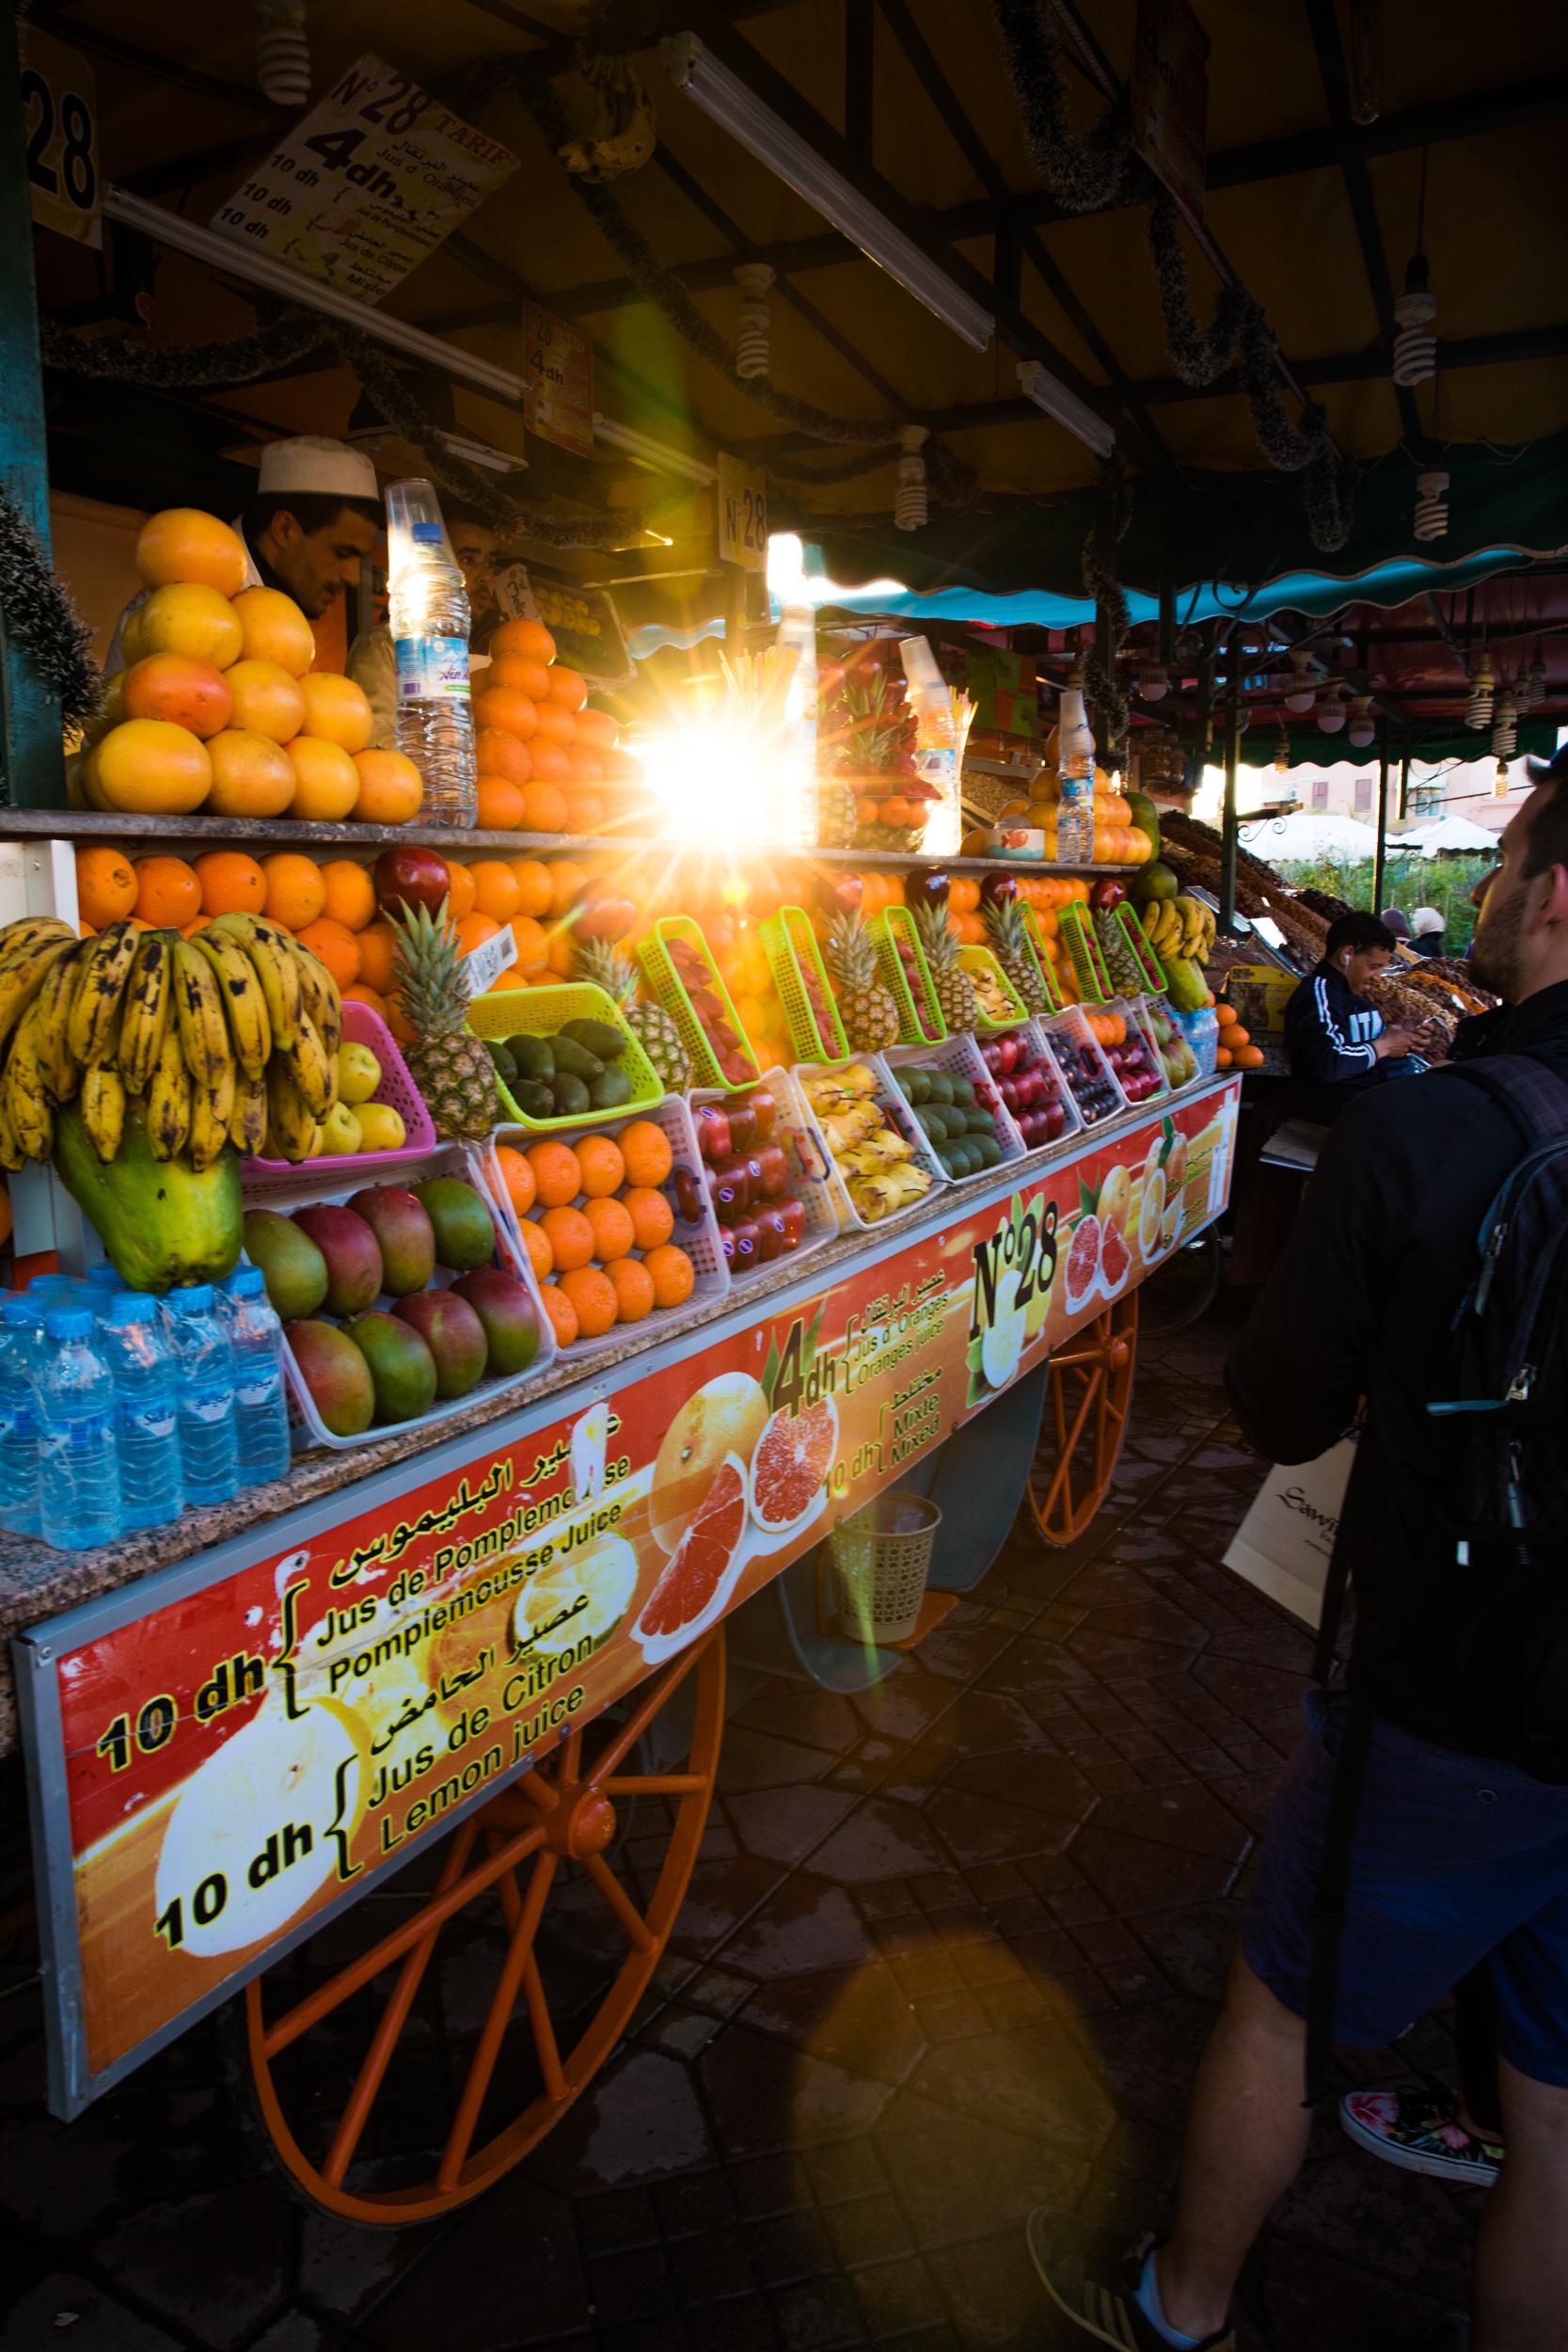 Colin_Herrington_Maroc_Stories-23.jpg